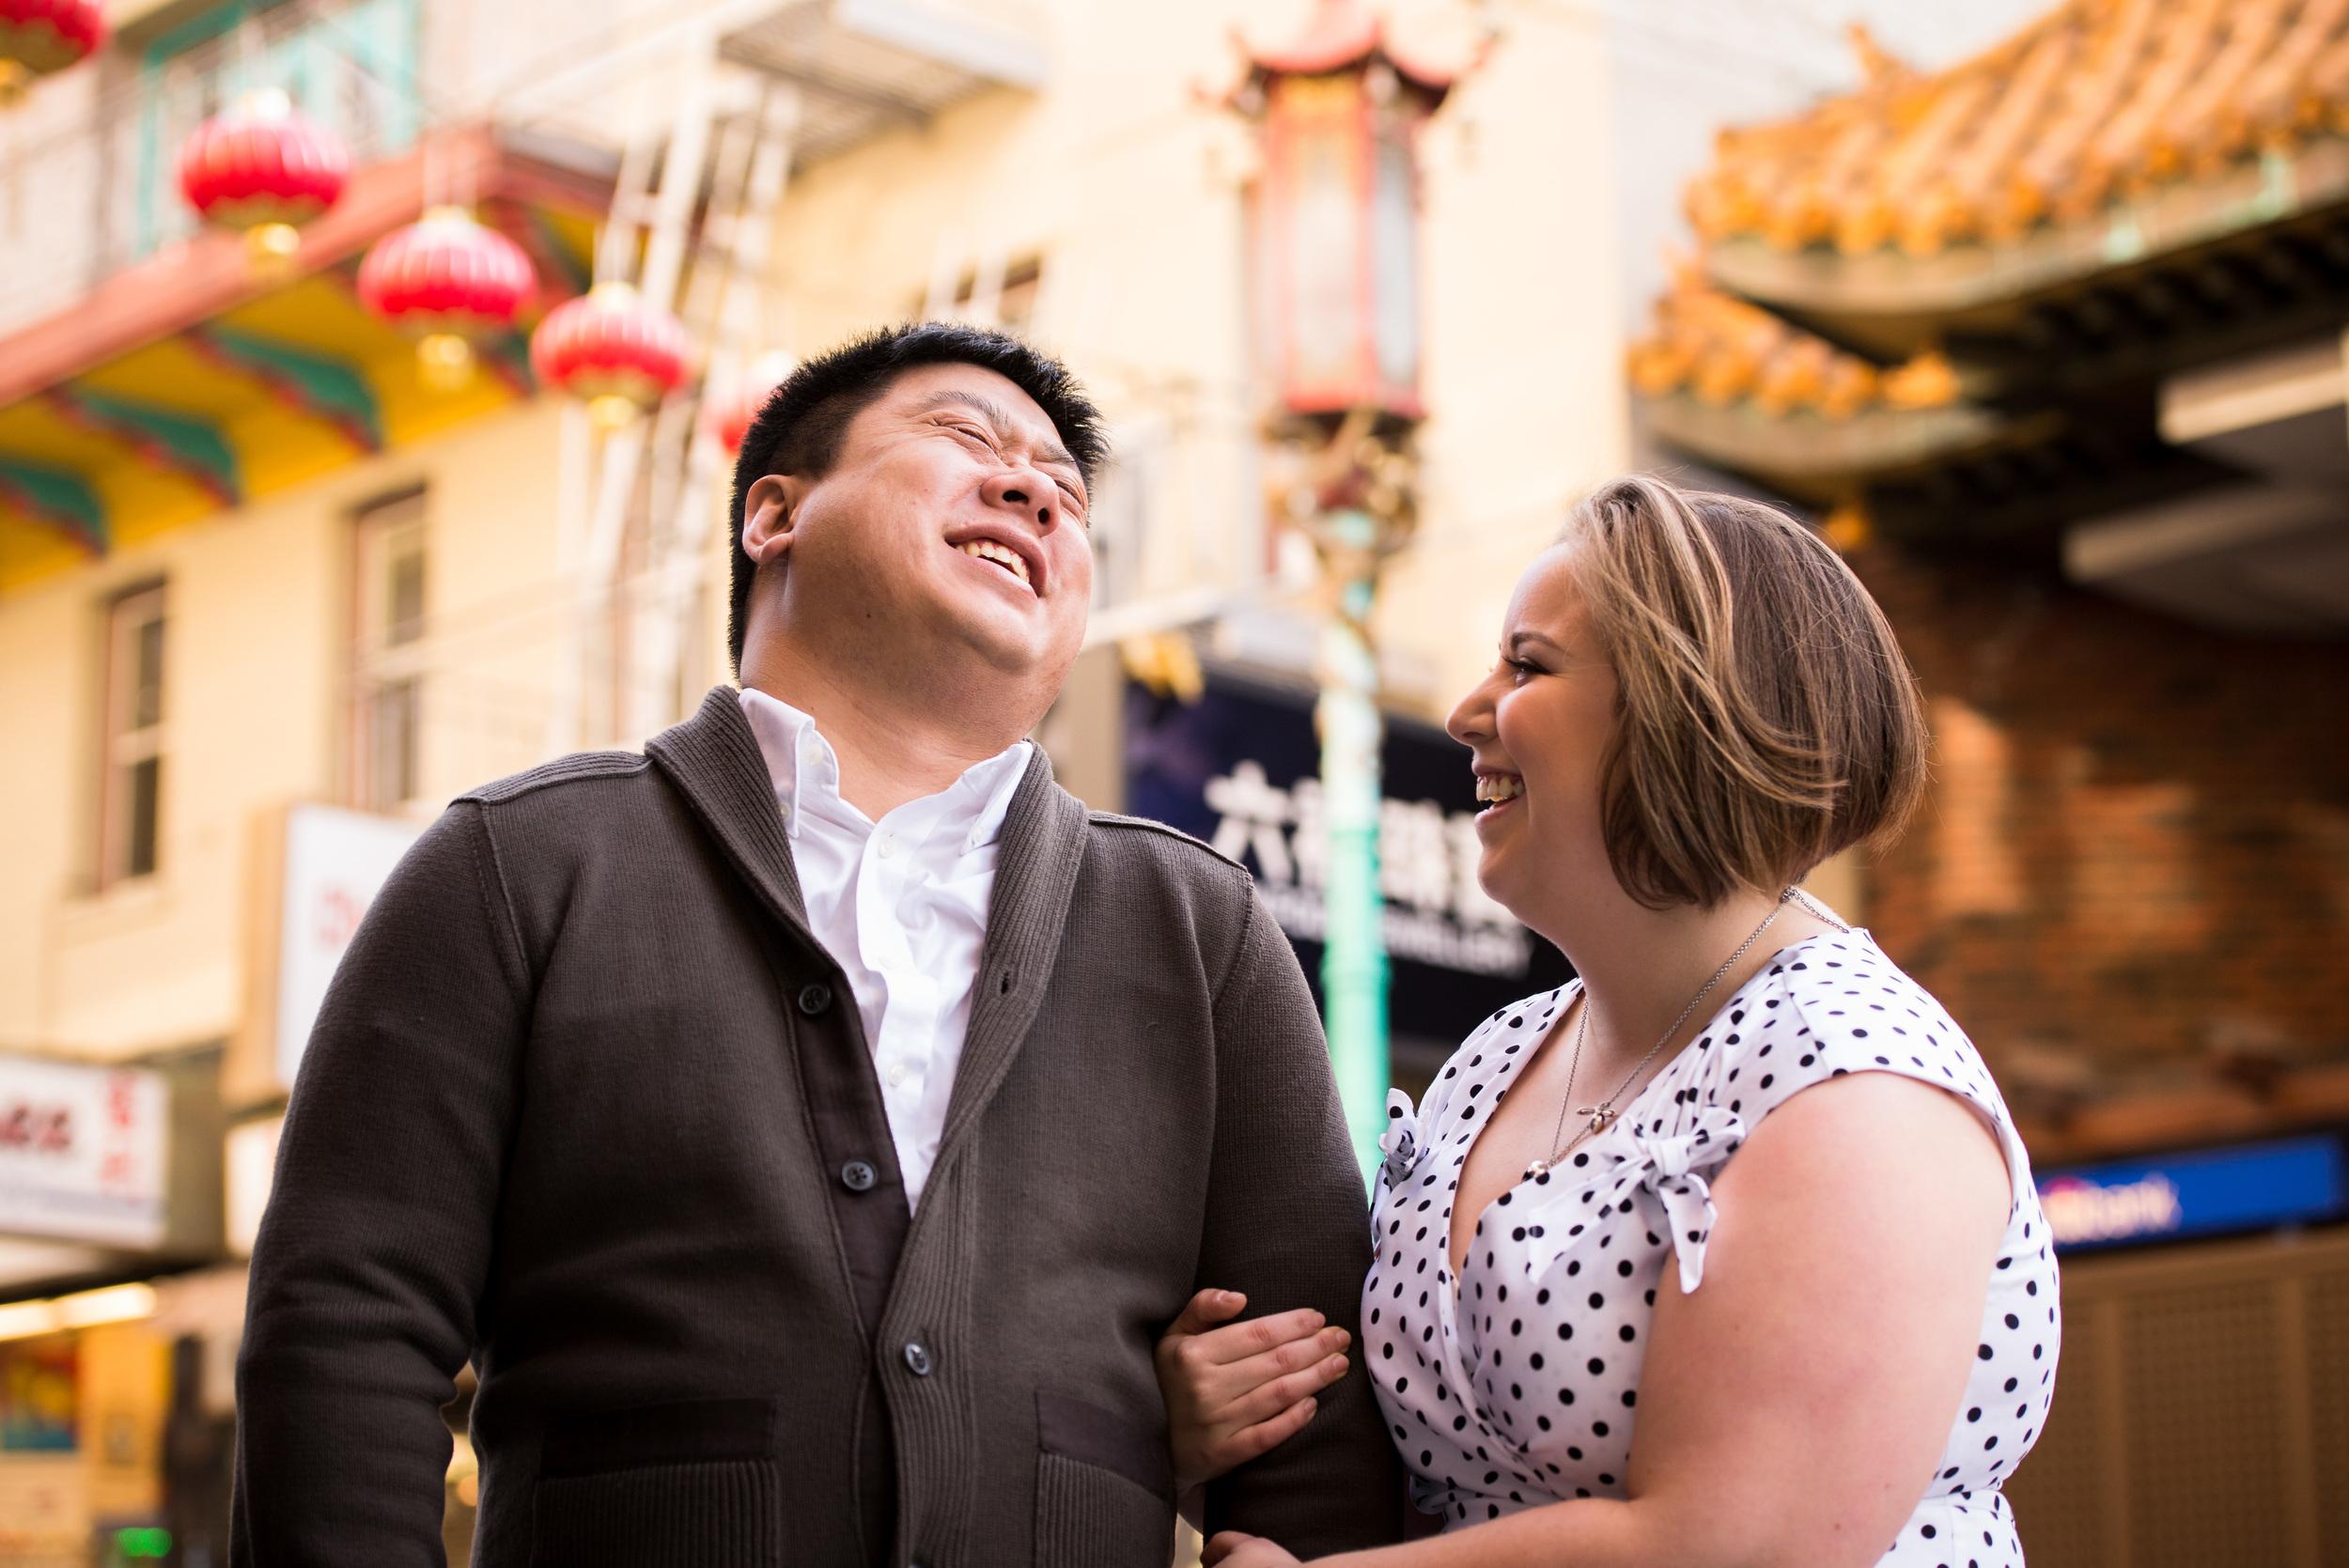 Kathryn&Jeff_Engagement-37.jpg